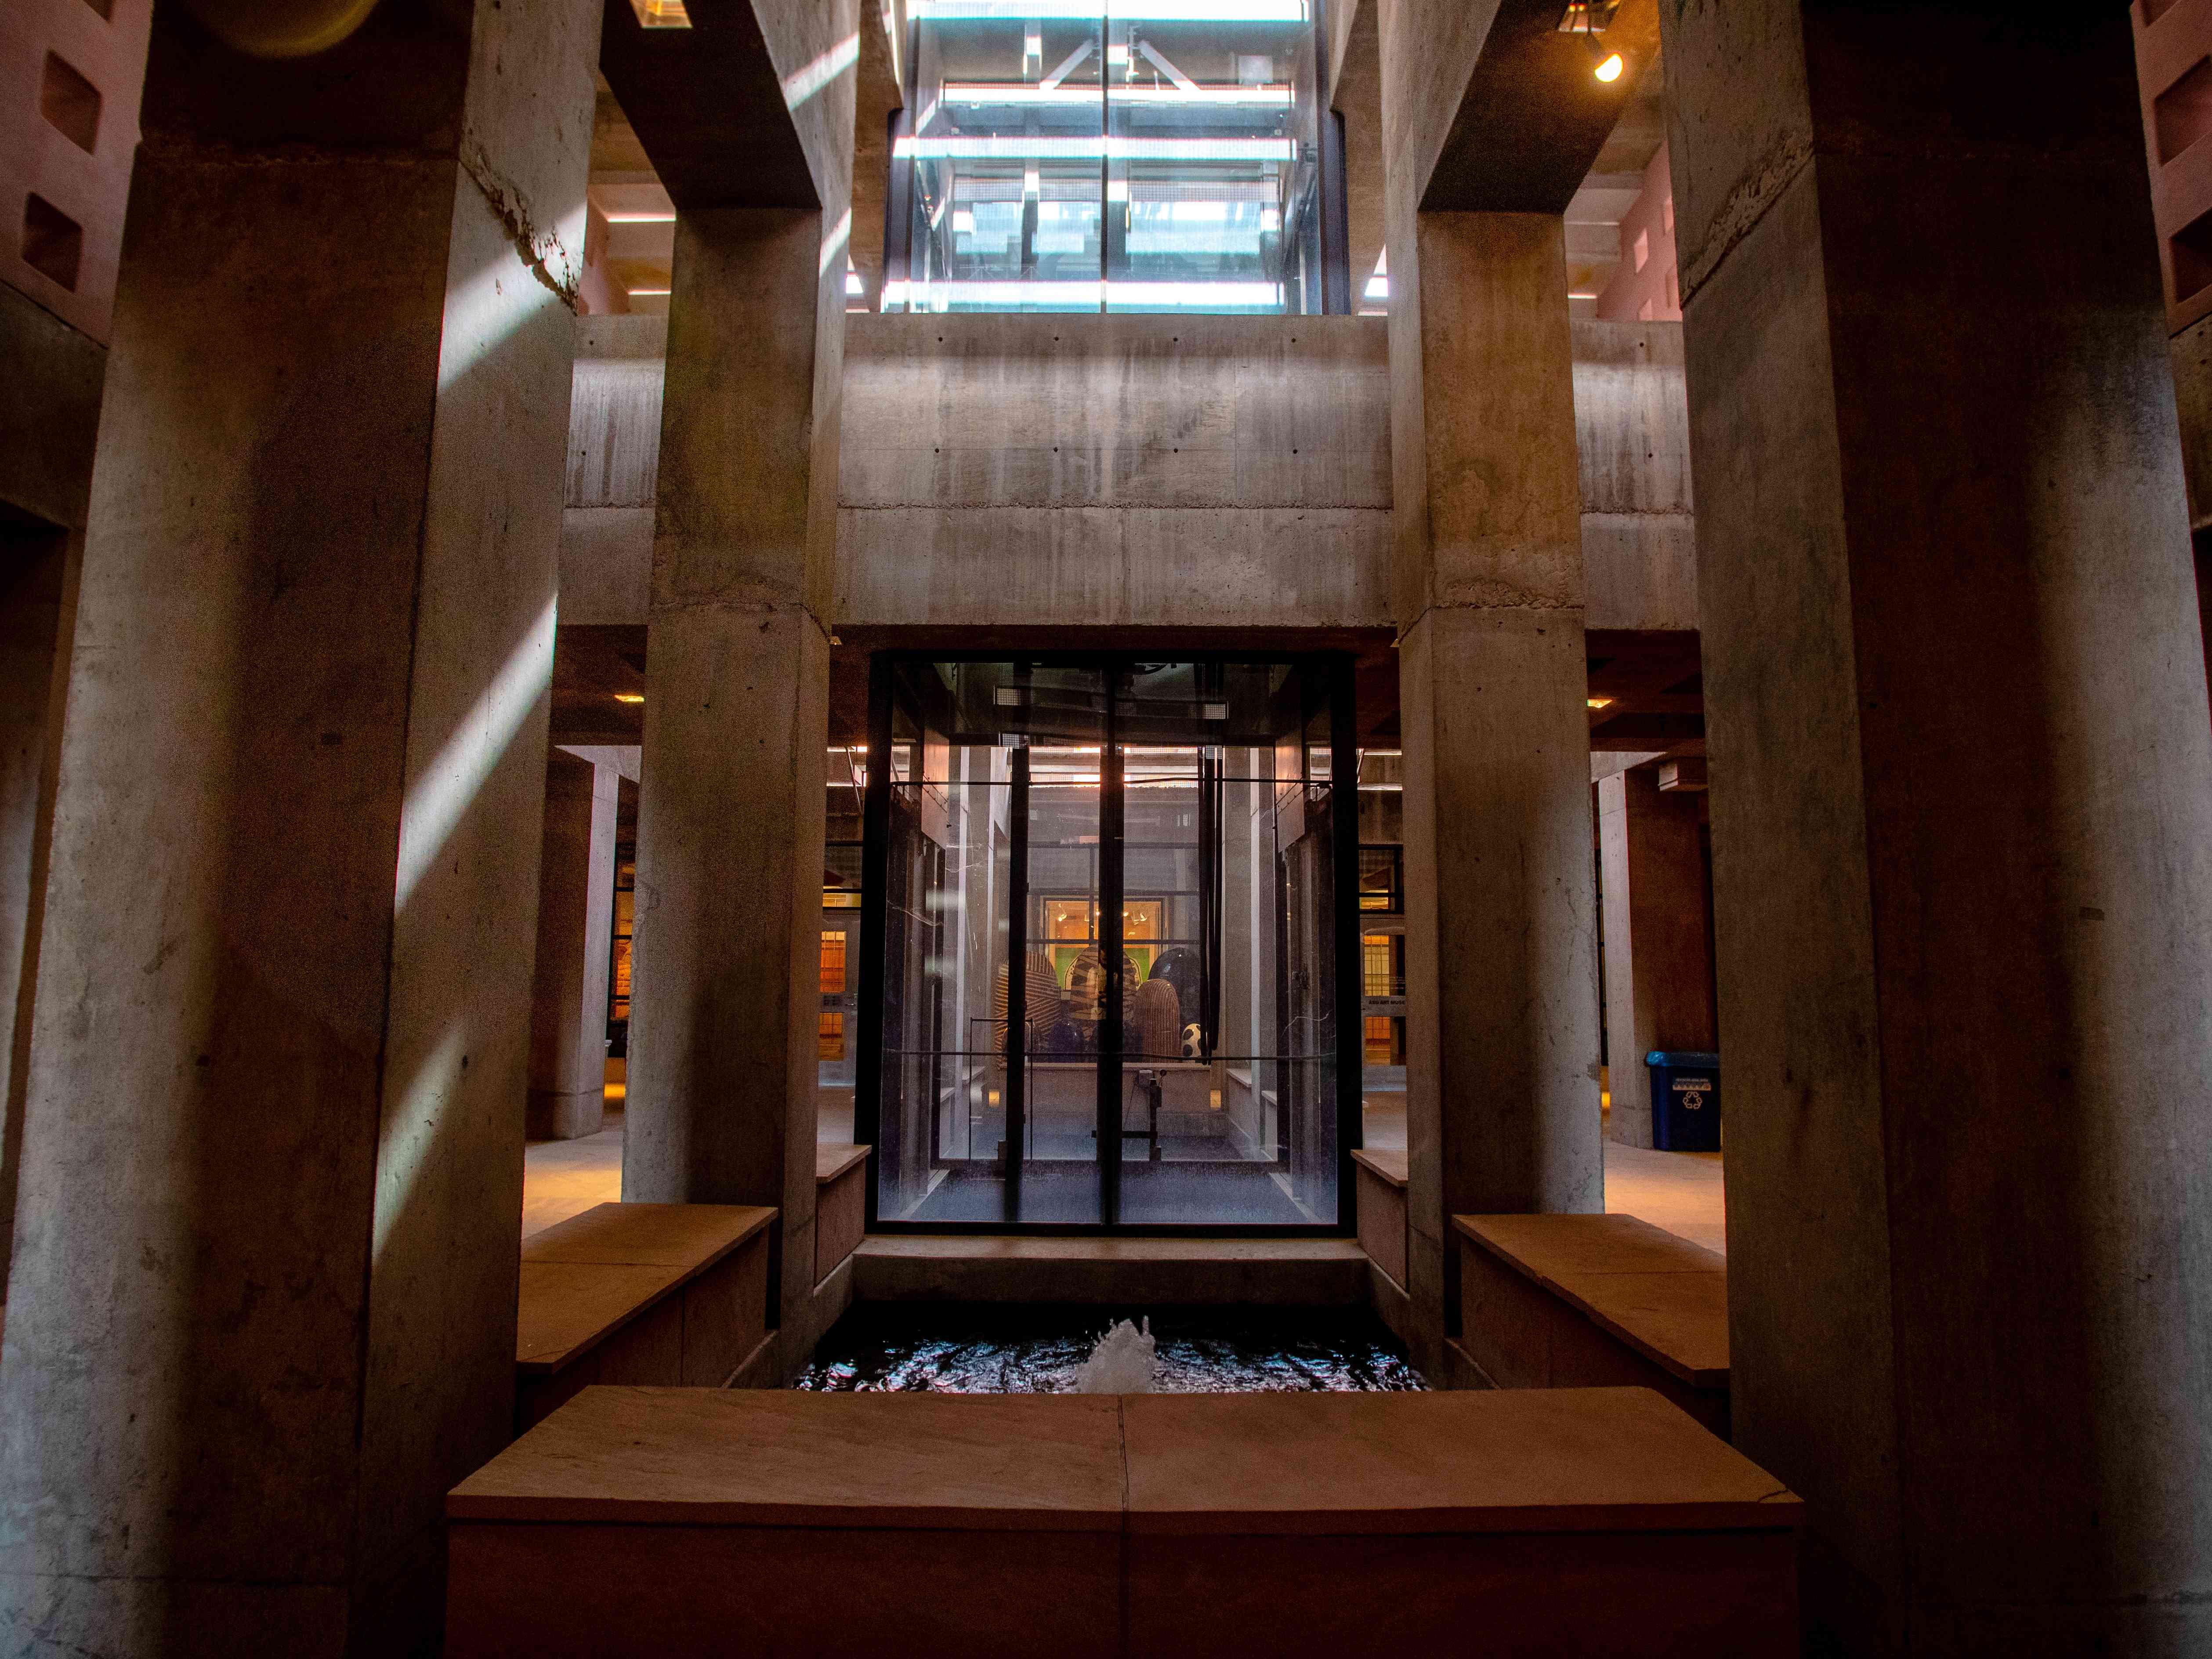 Museo de Arte de la Universidad Estatal de Arizona en Phoenix, Arizona